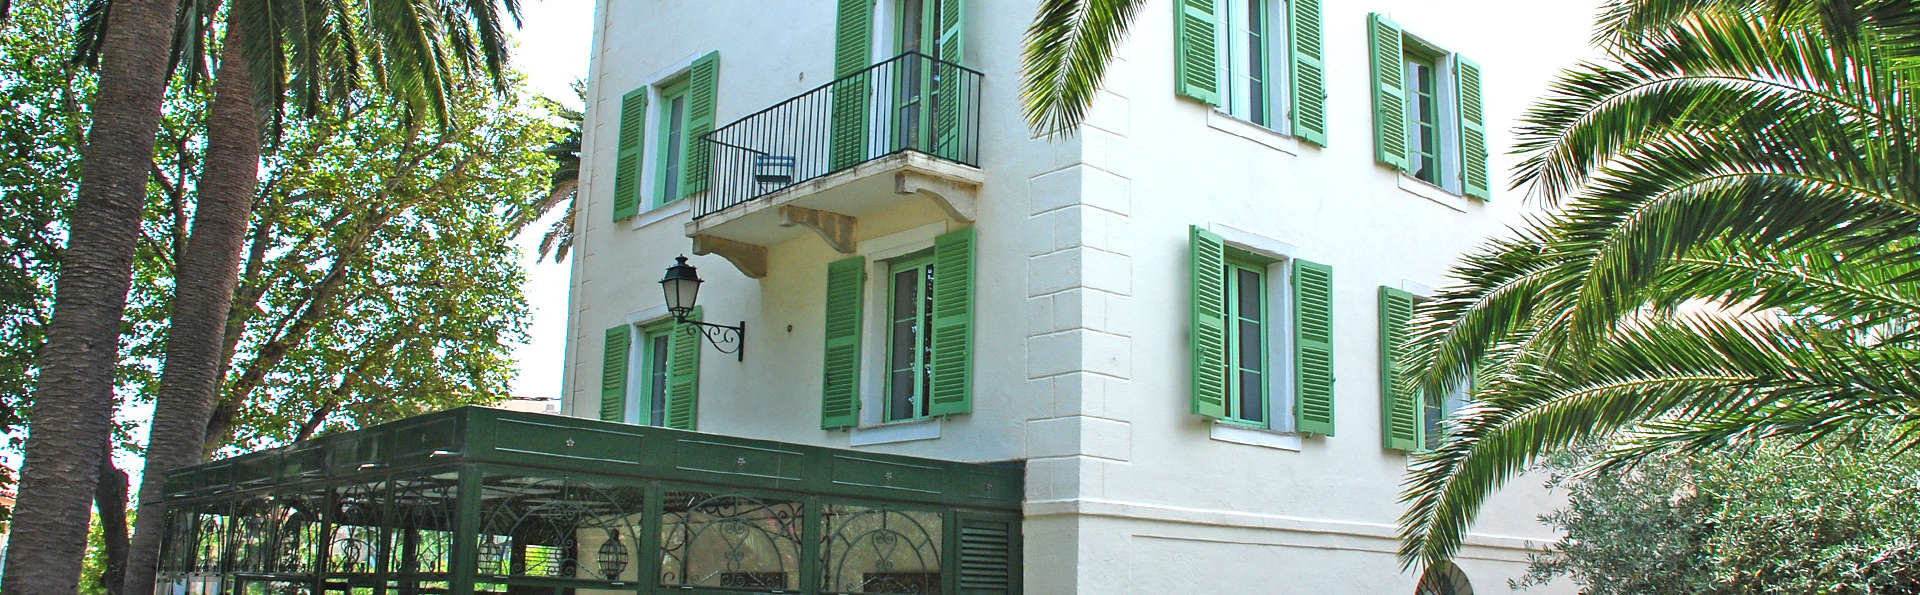 Hôtel Demeure Castel Brando - EDIT_front.jpg